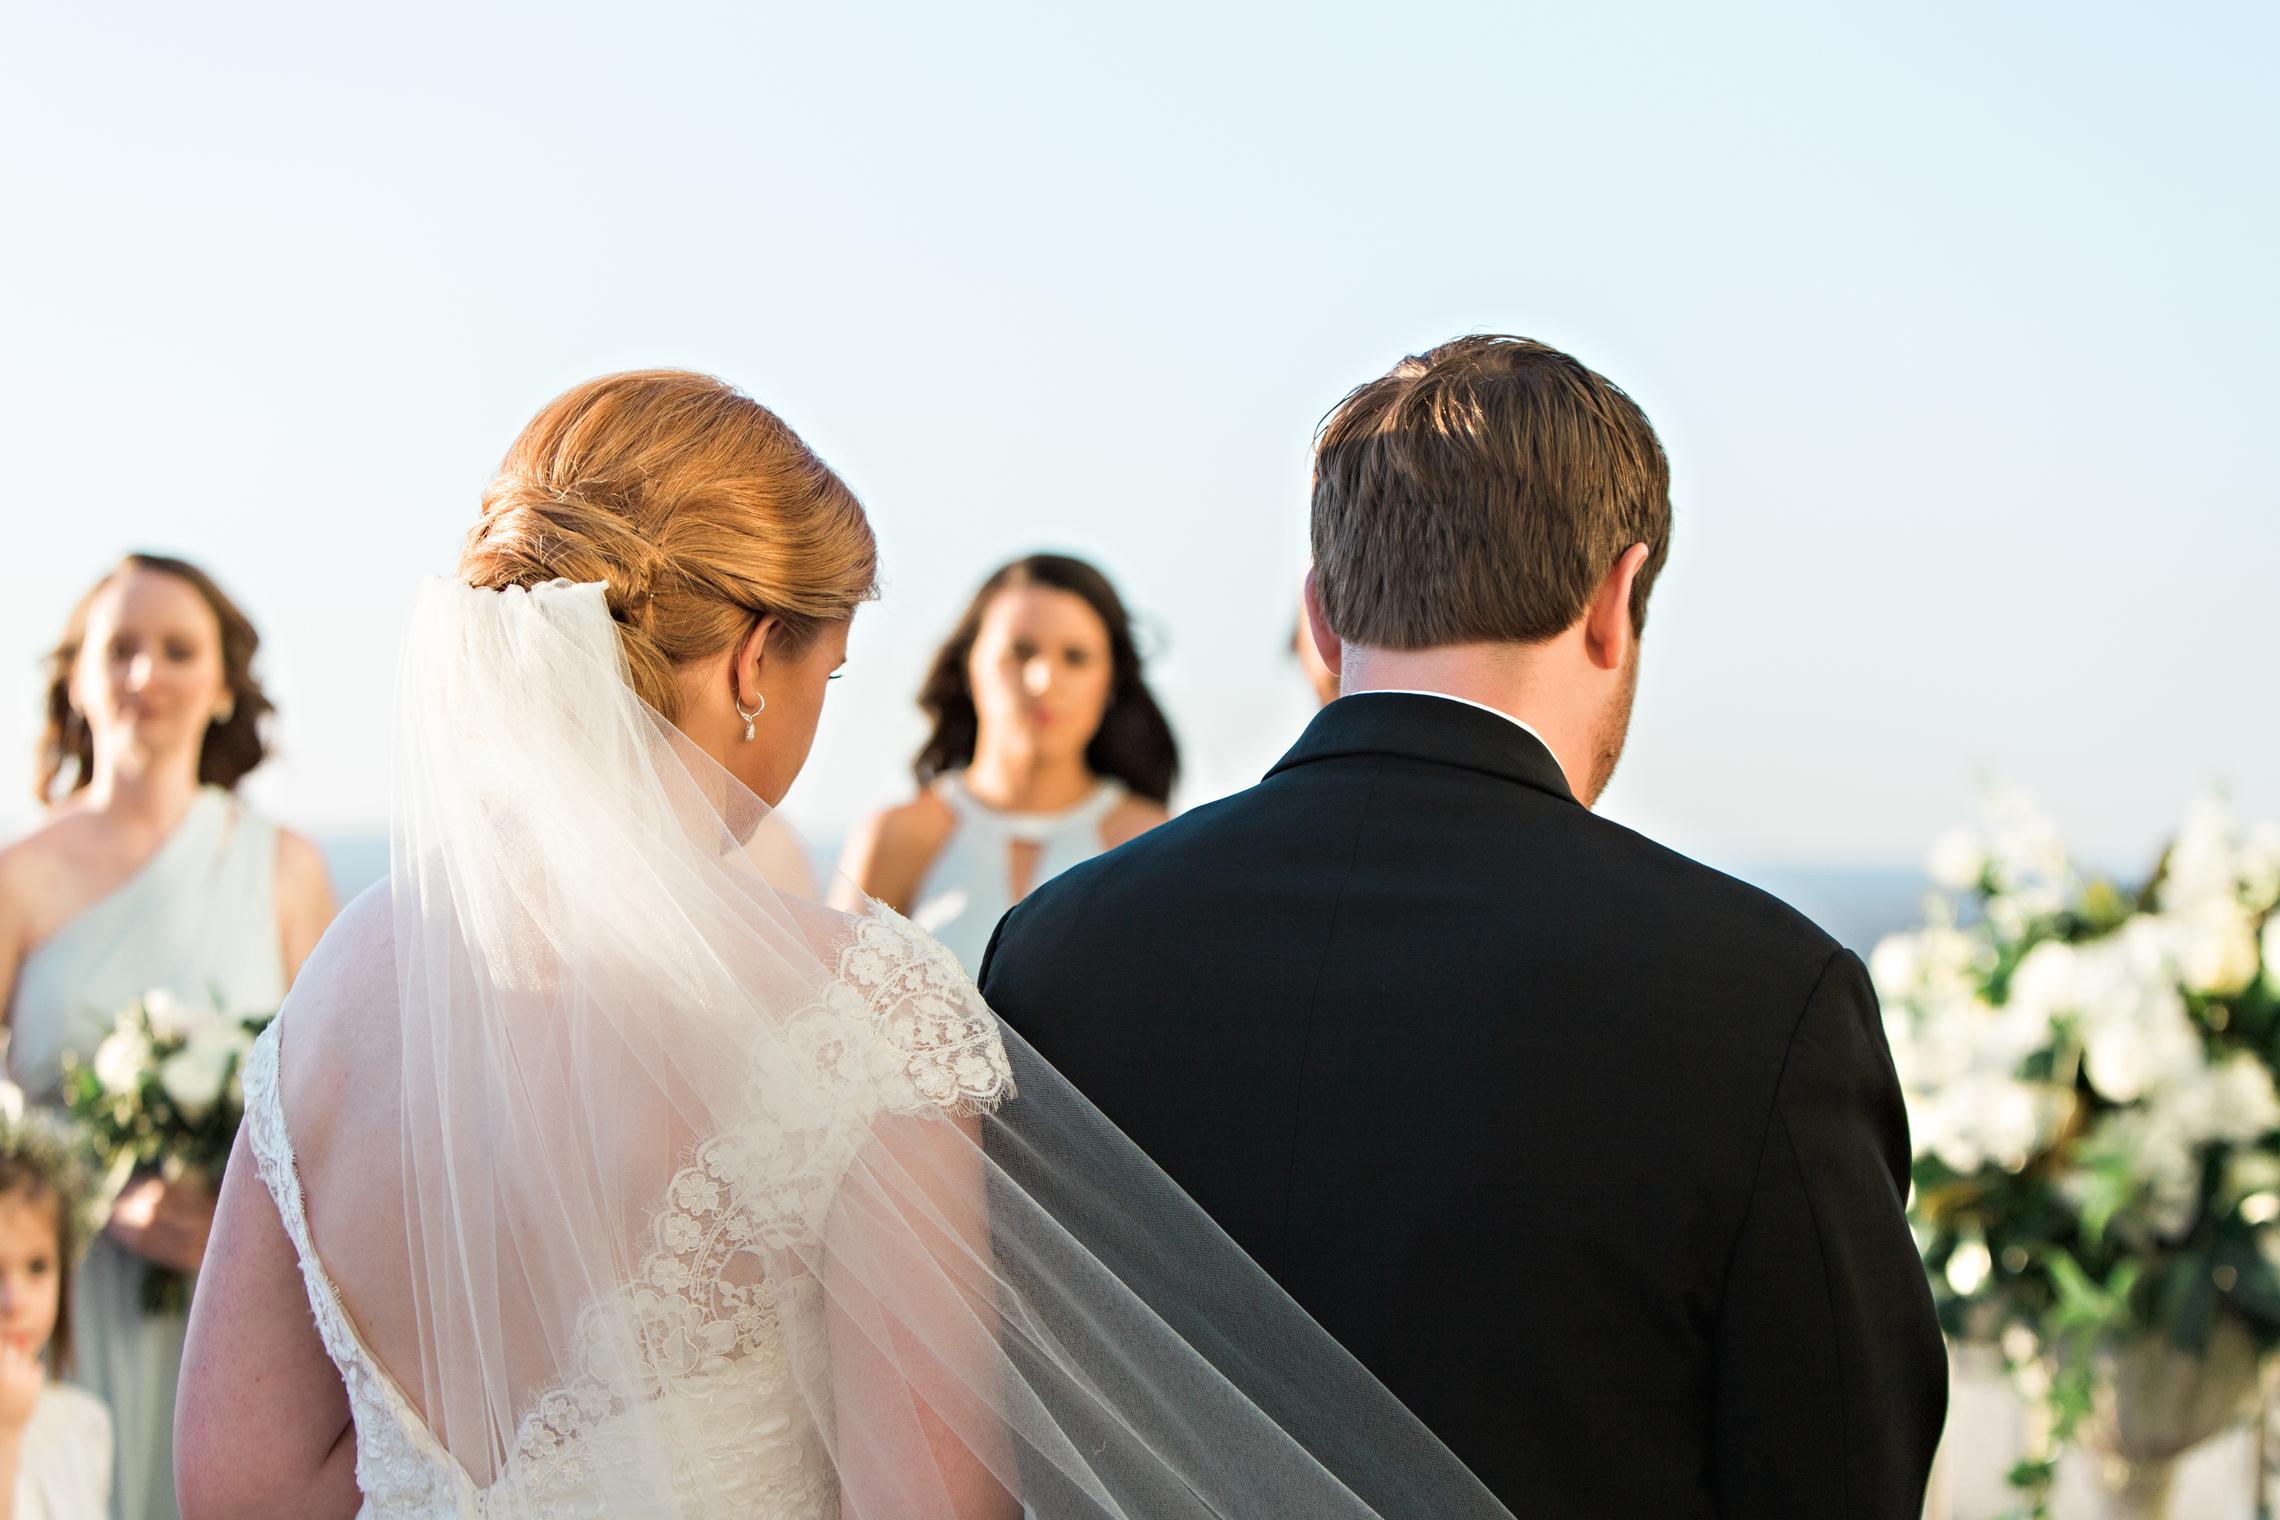 Matty-Drollette-Photography-Weddings-Montgomery-Alabama-127.jpg